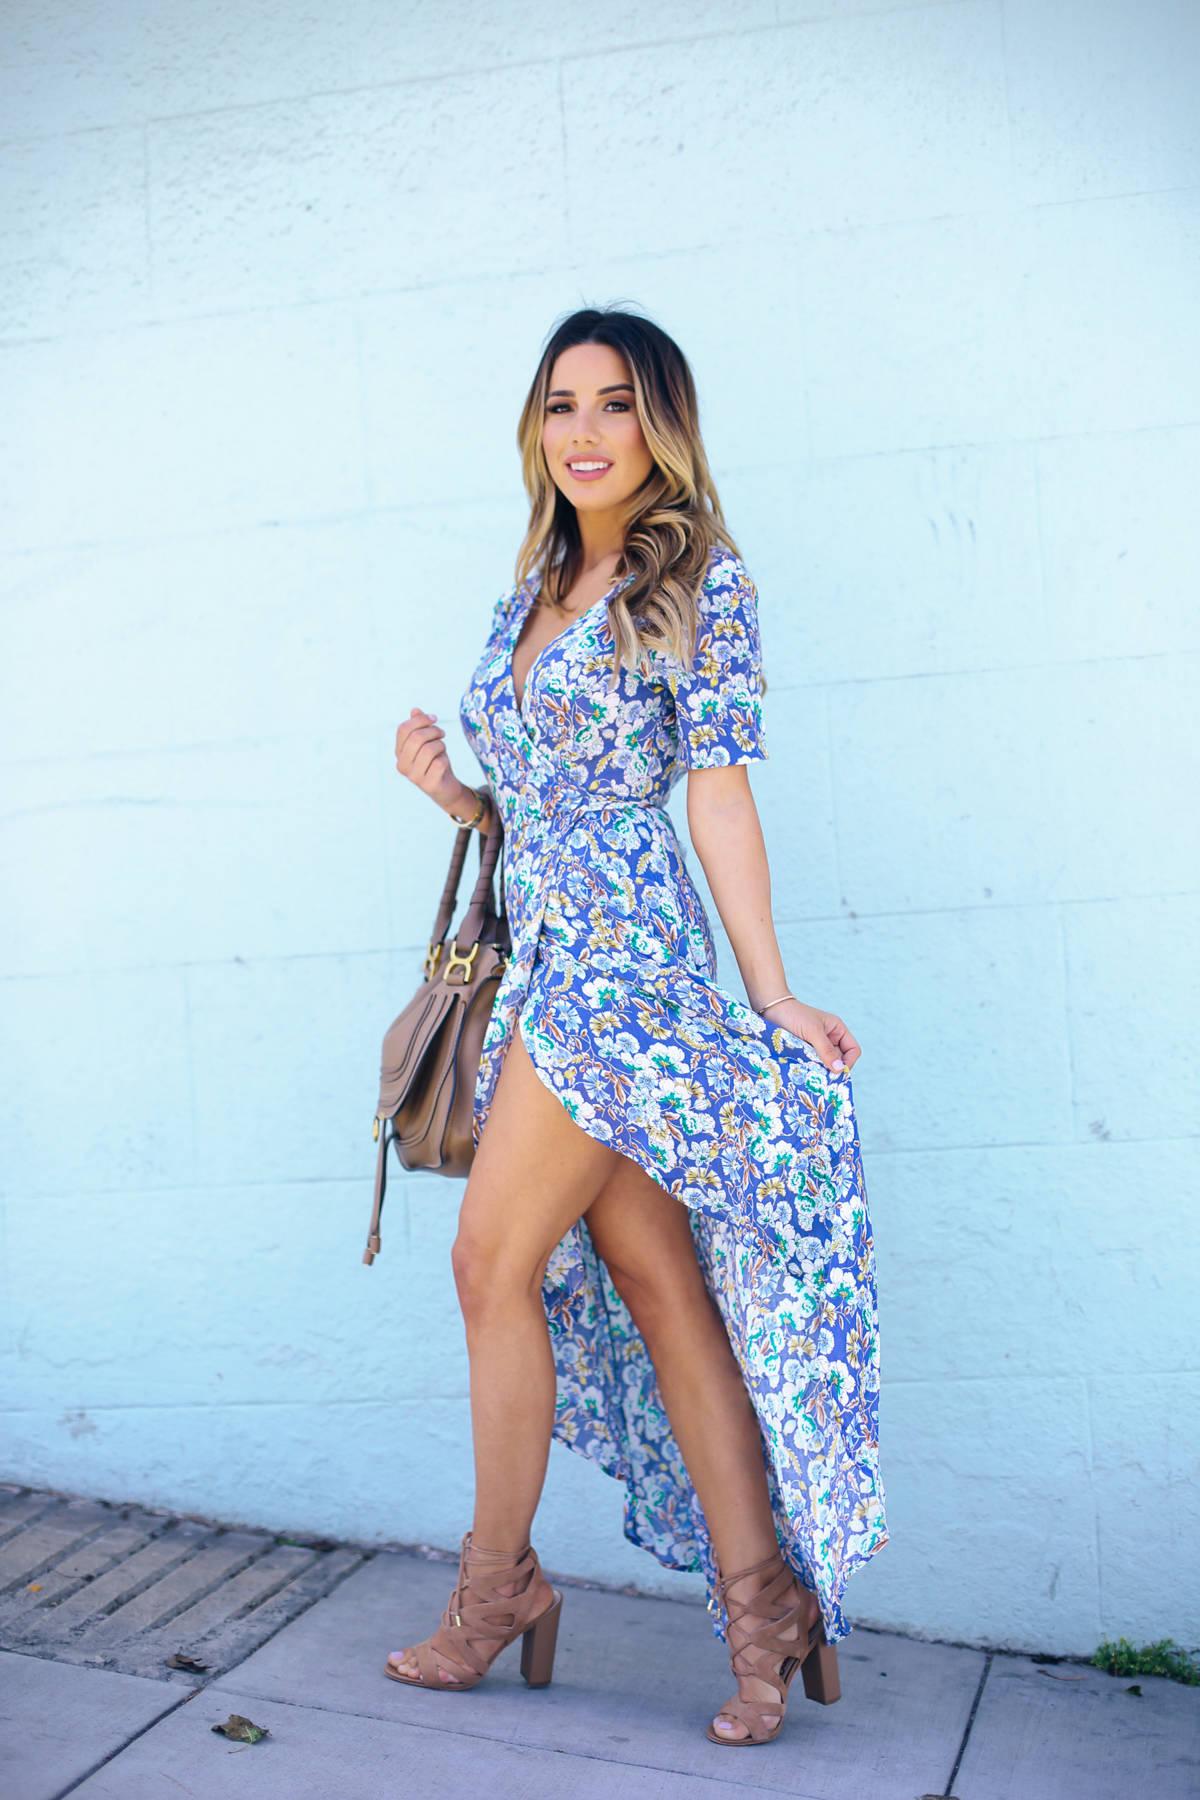 Ariana-Lauren-FashionBorn-ASTR-Nordstrom-Maxi-Dress-Spring-Looks-RyanbyRyanChua-2915